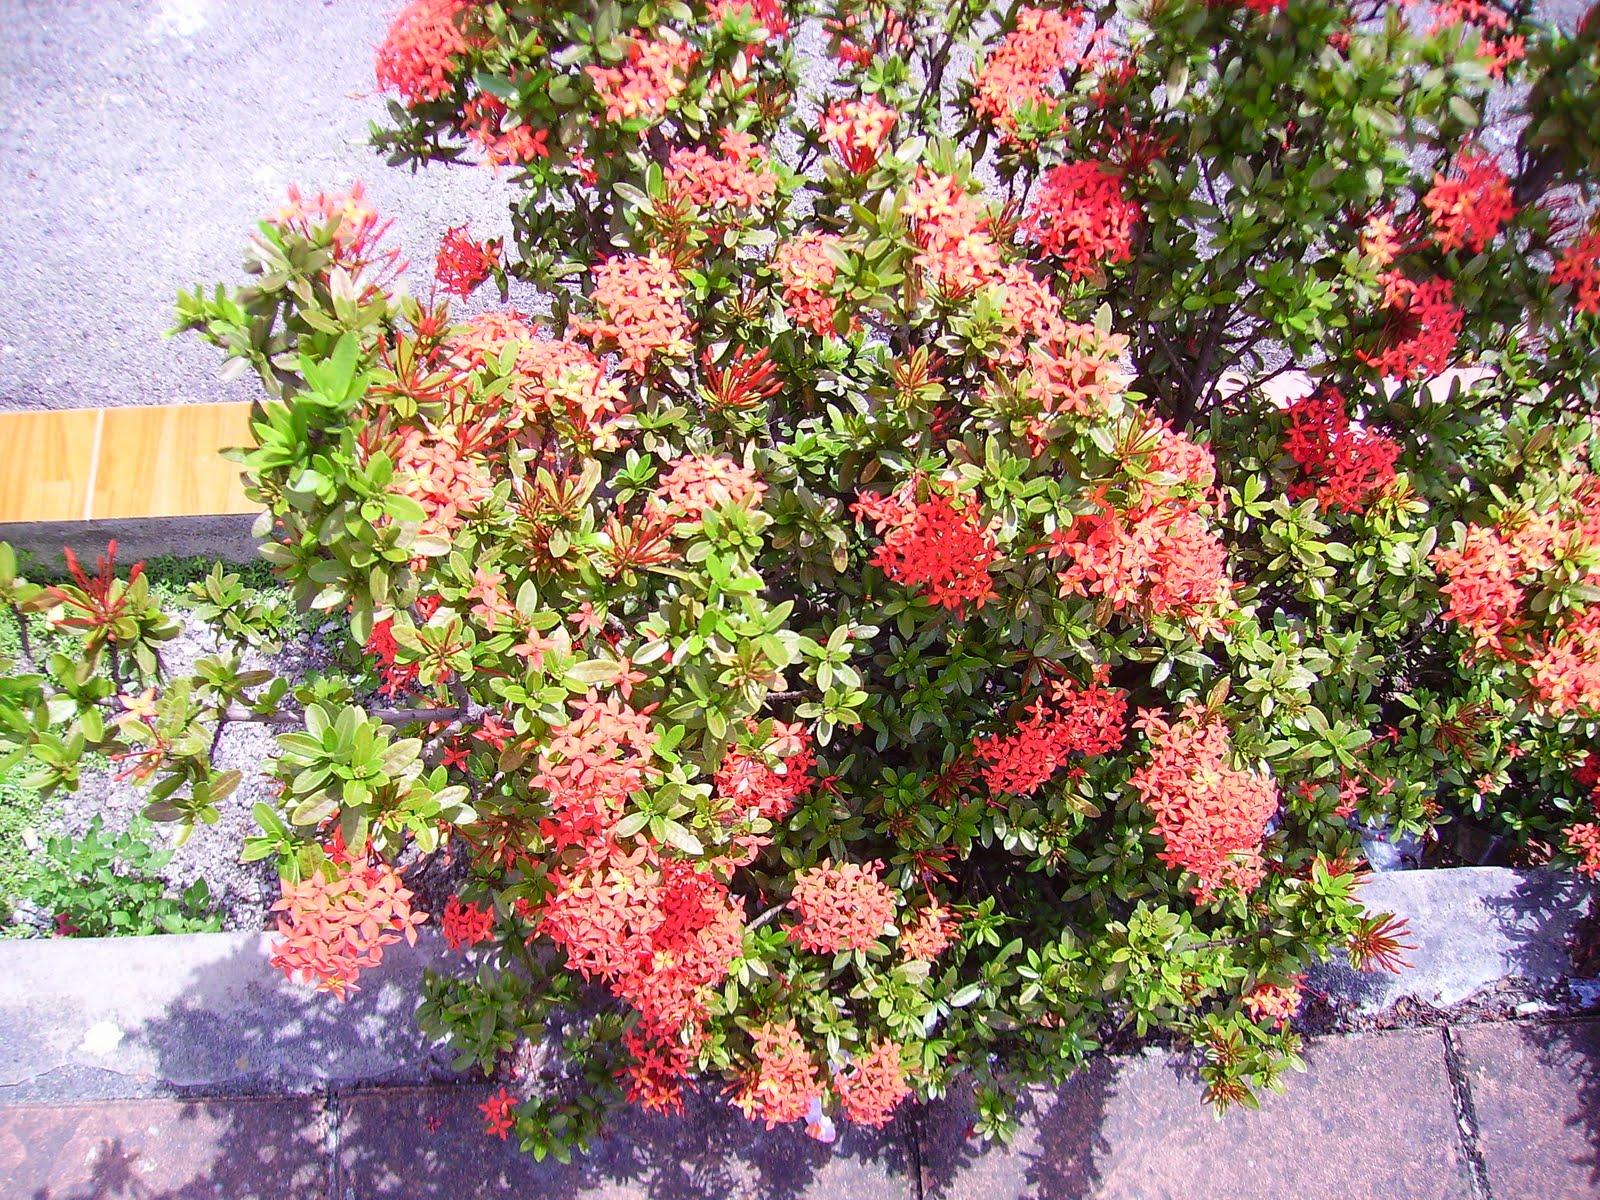 Garden Chronicles: Common plants along the Roadside